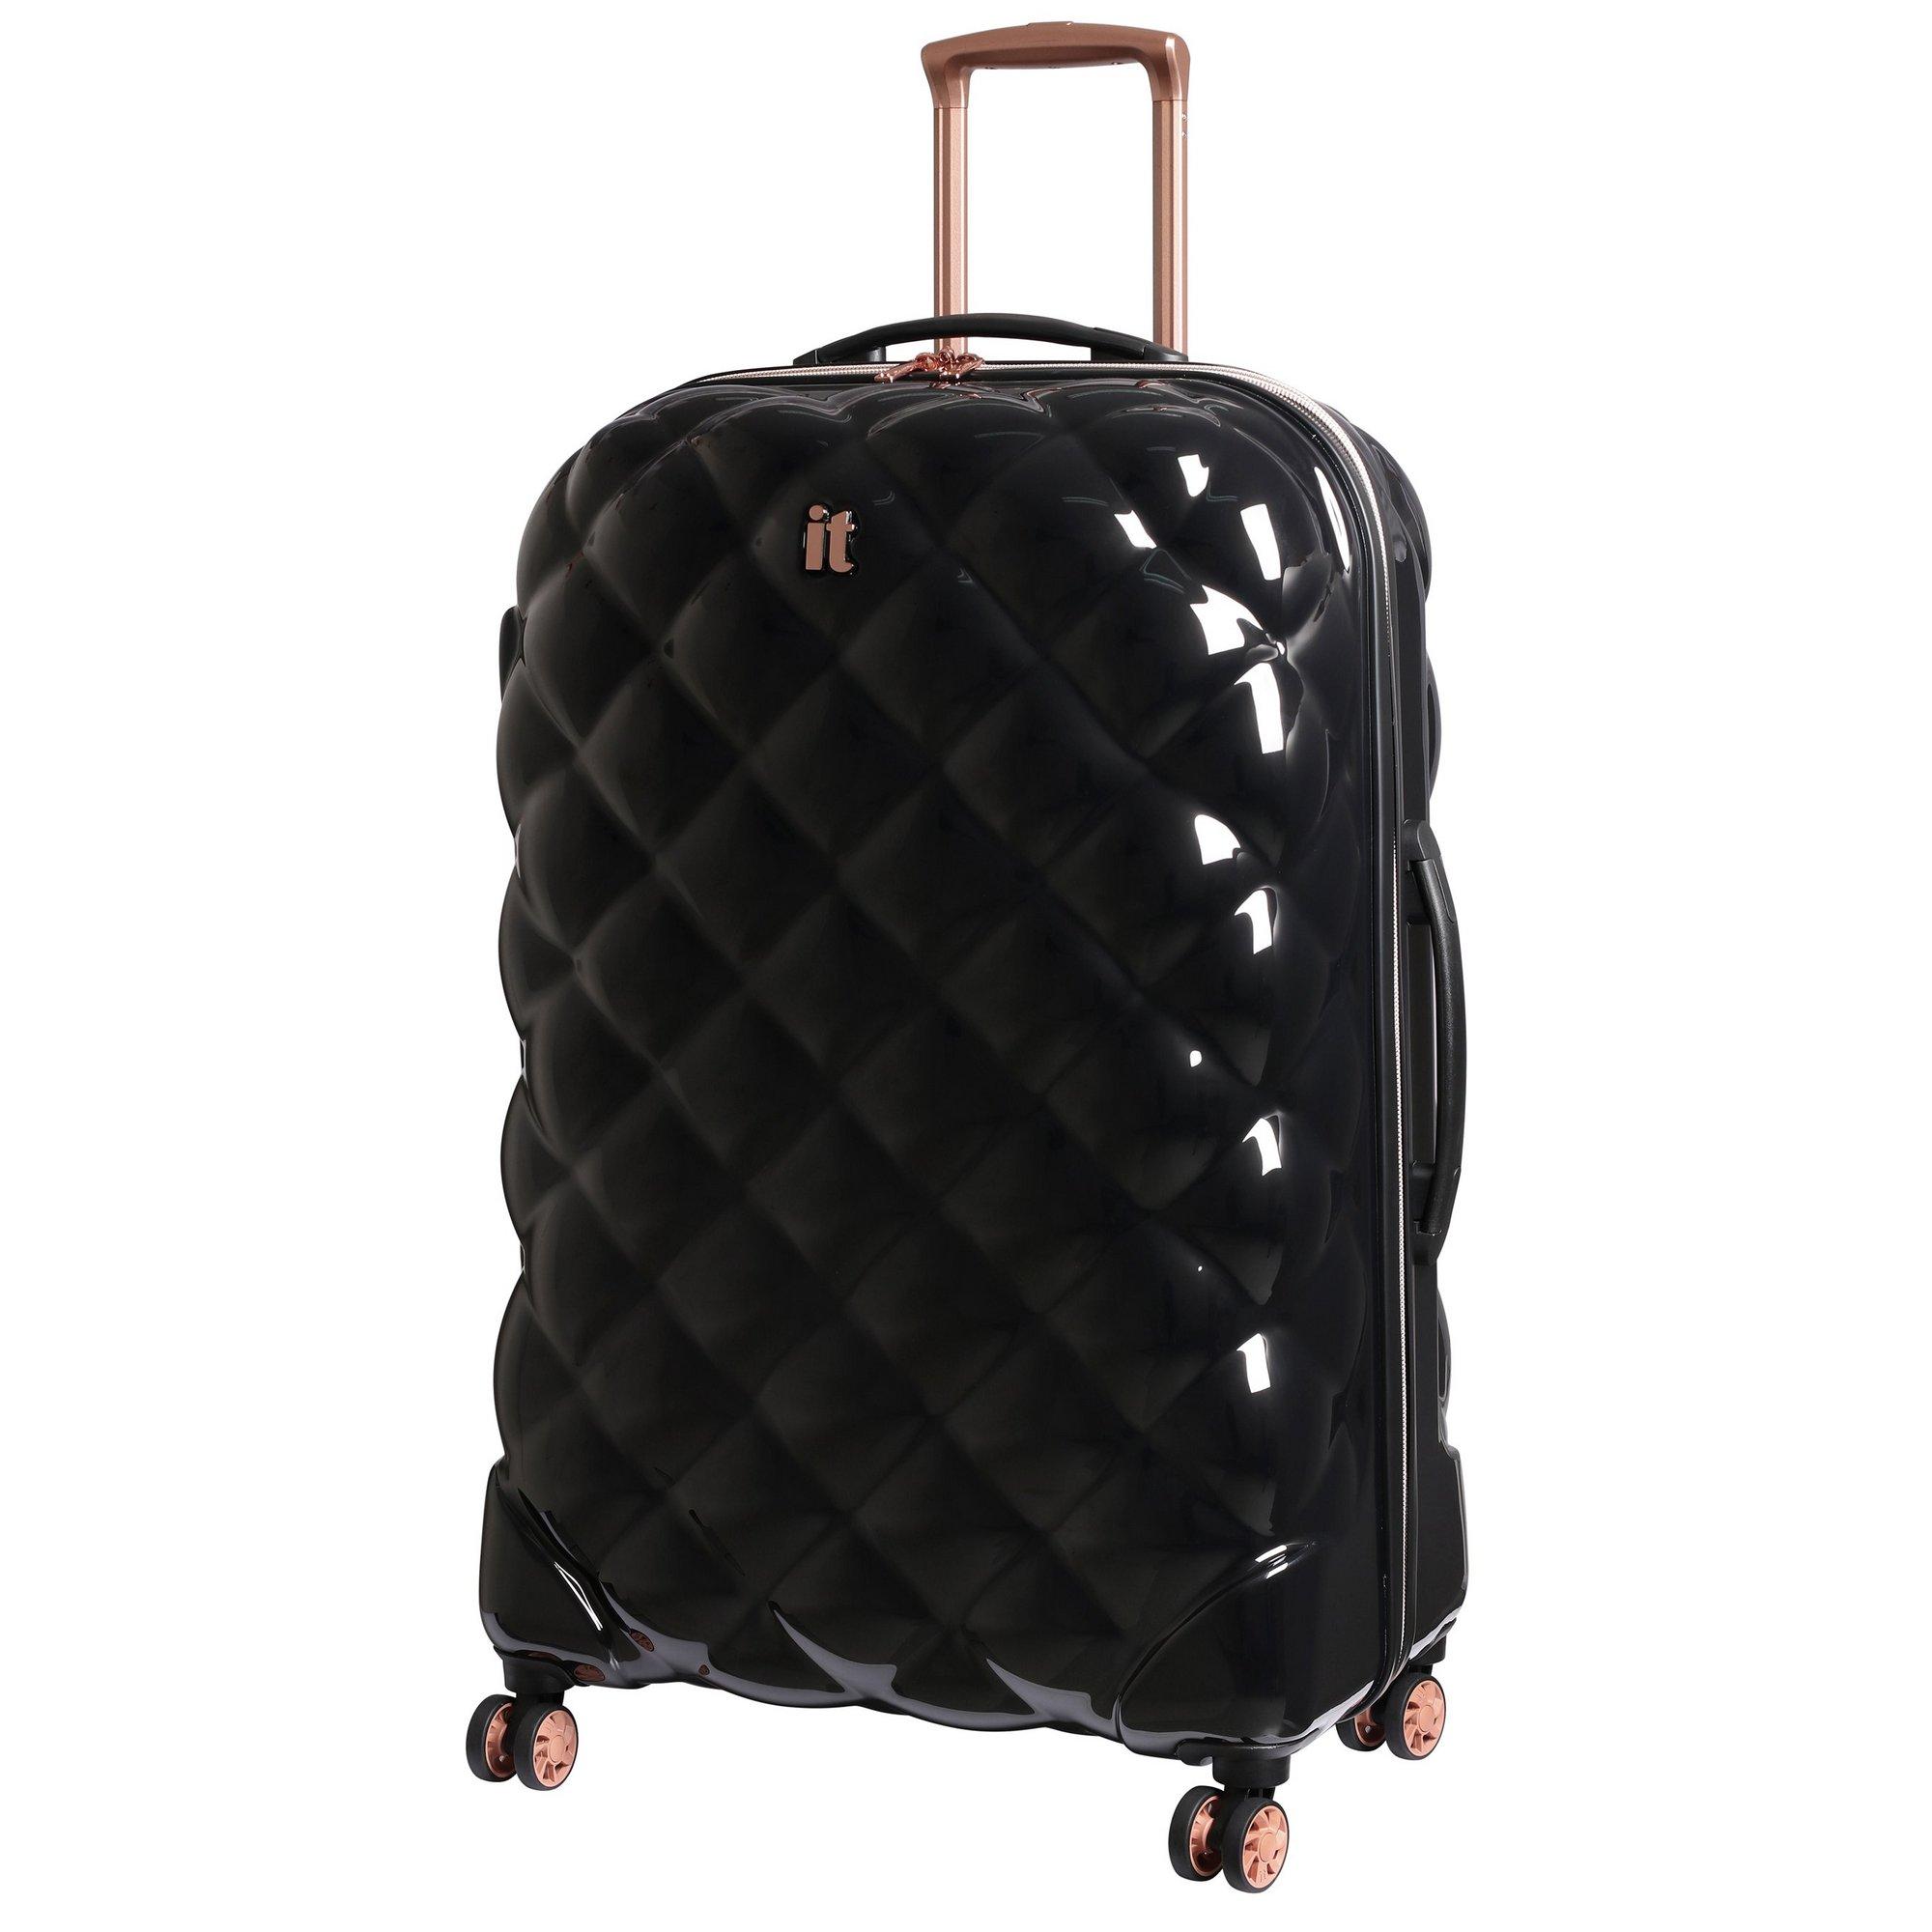 Image of IT Luggage St. Tropez Deux 8 Wheel Black Expander Suitcase